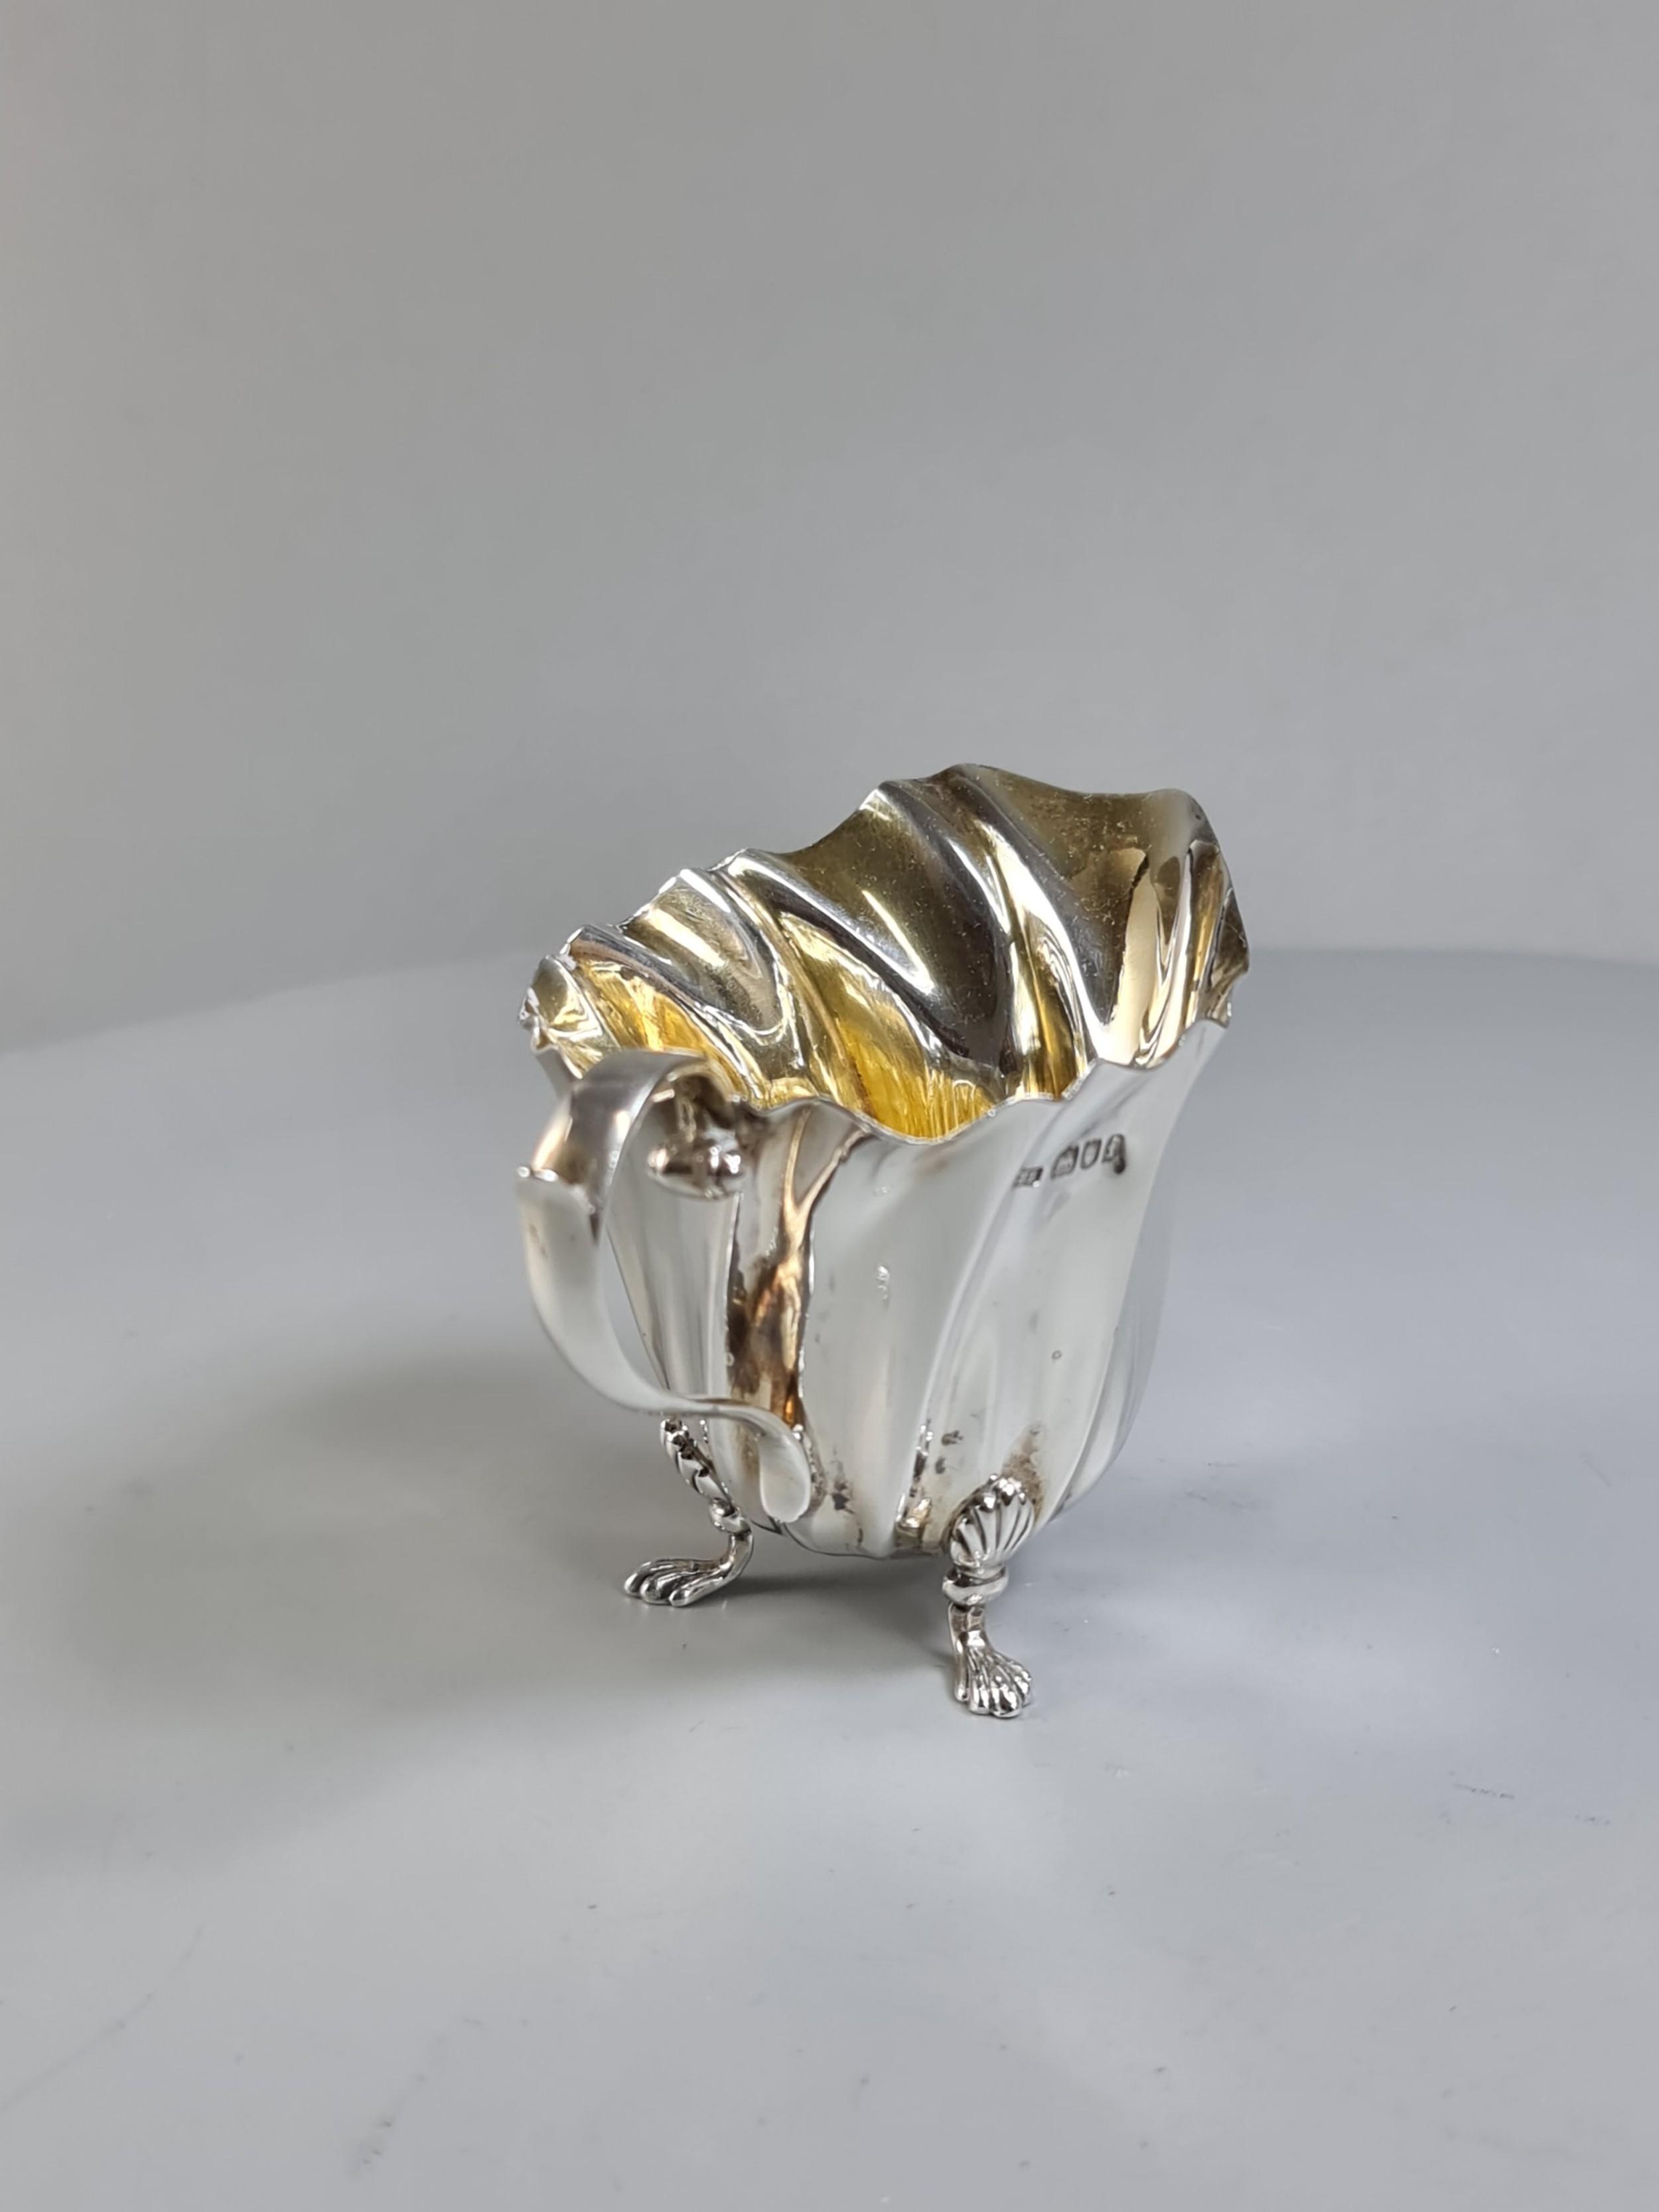 beautiful hm silver naturalistic jug c1901 levesley brothers thomas levesley